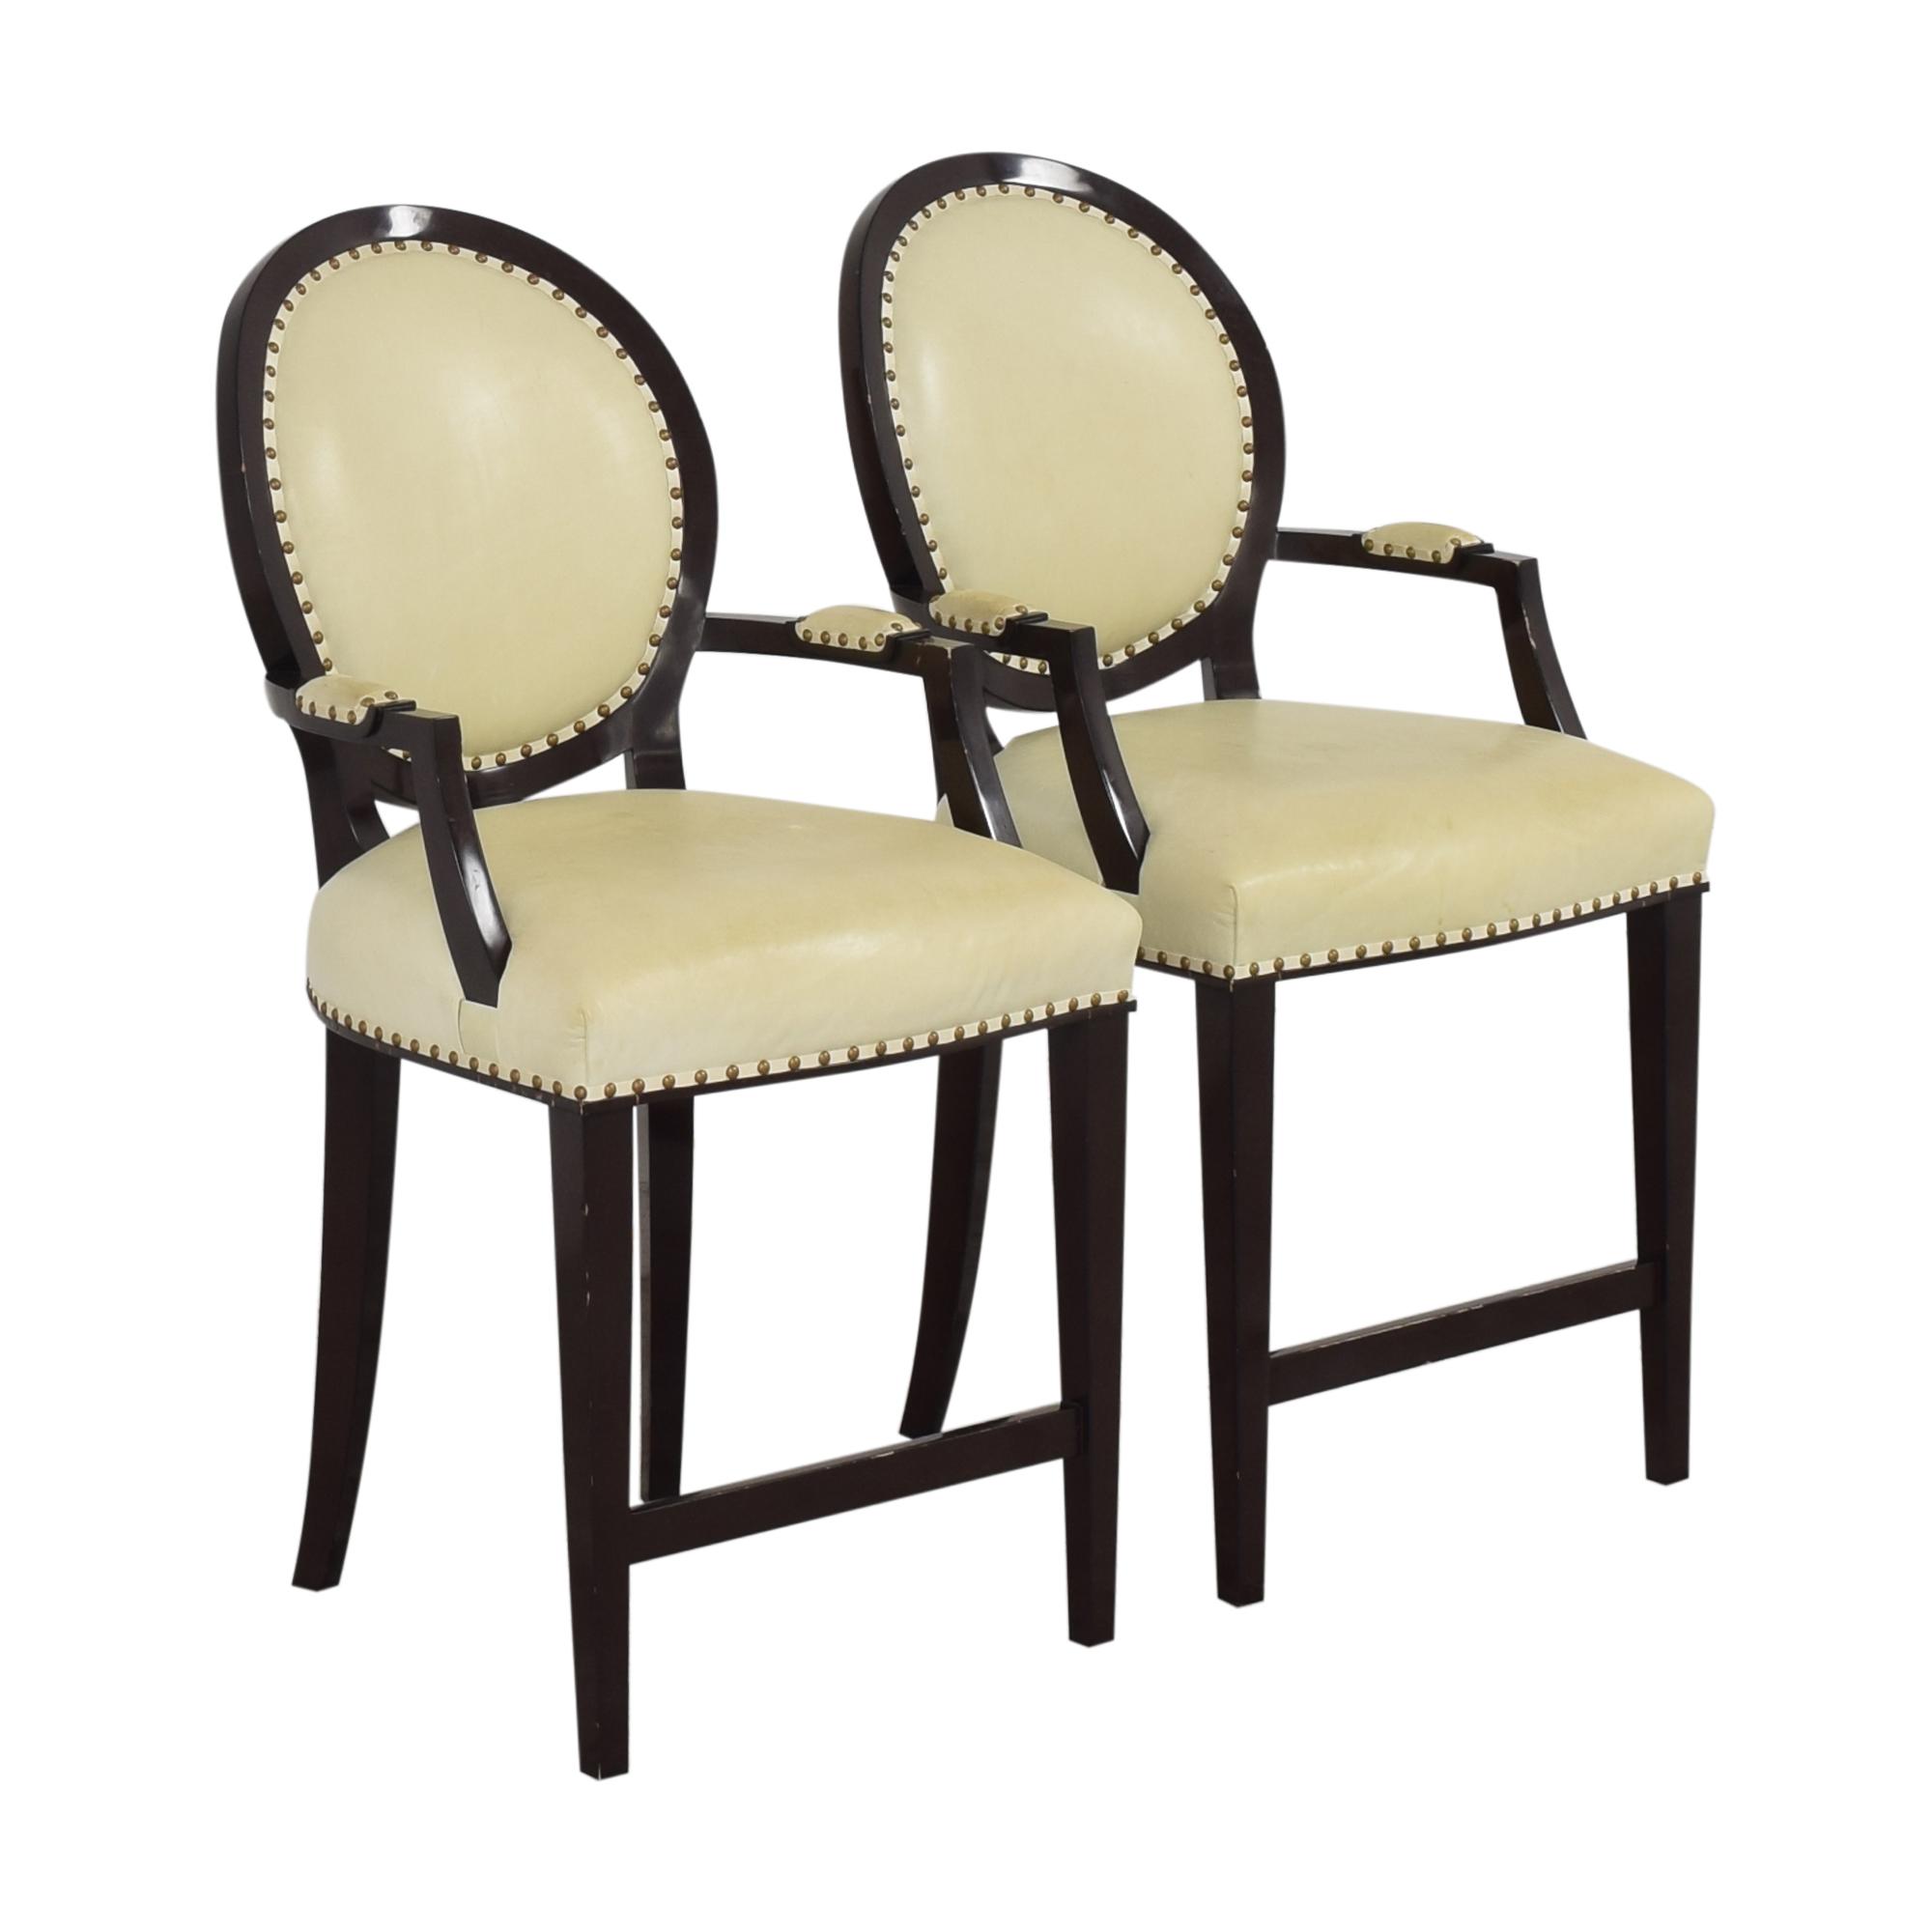 Nancy Corzine Louis XVI Arm Chairs / Chairs